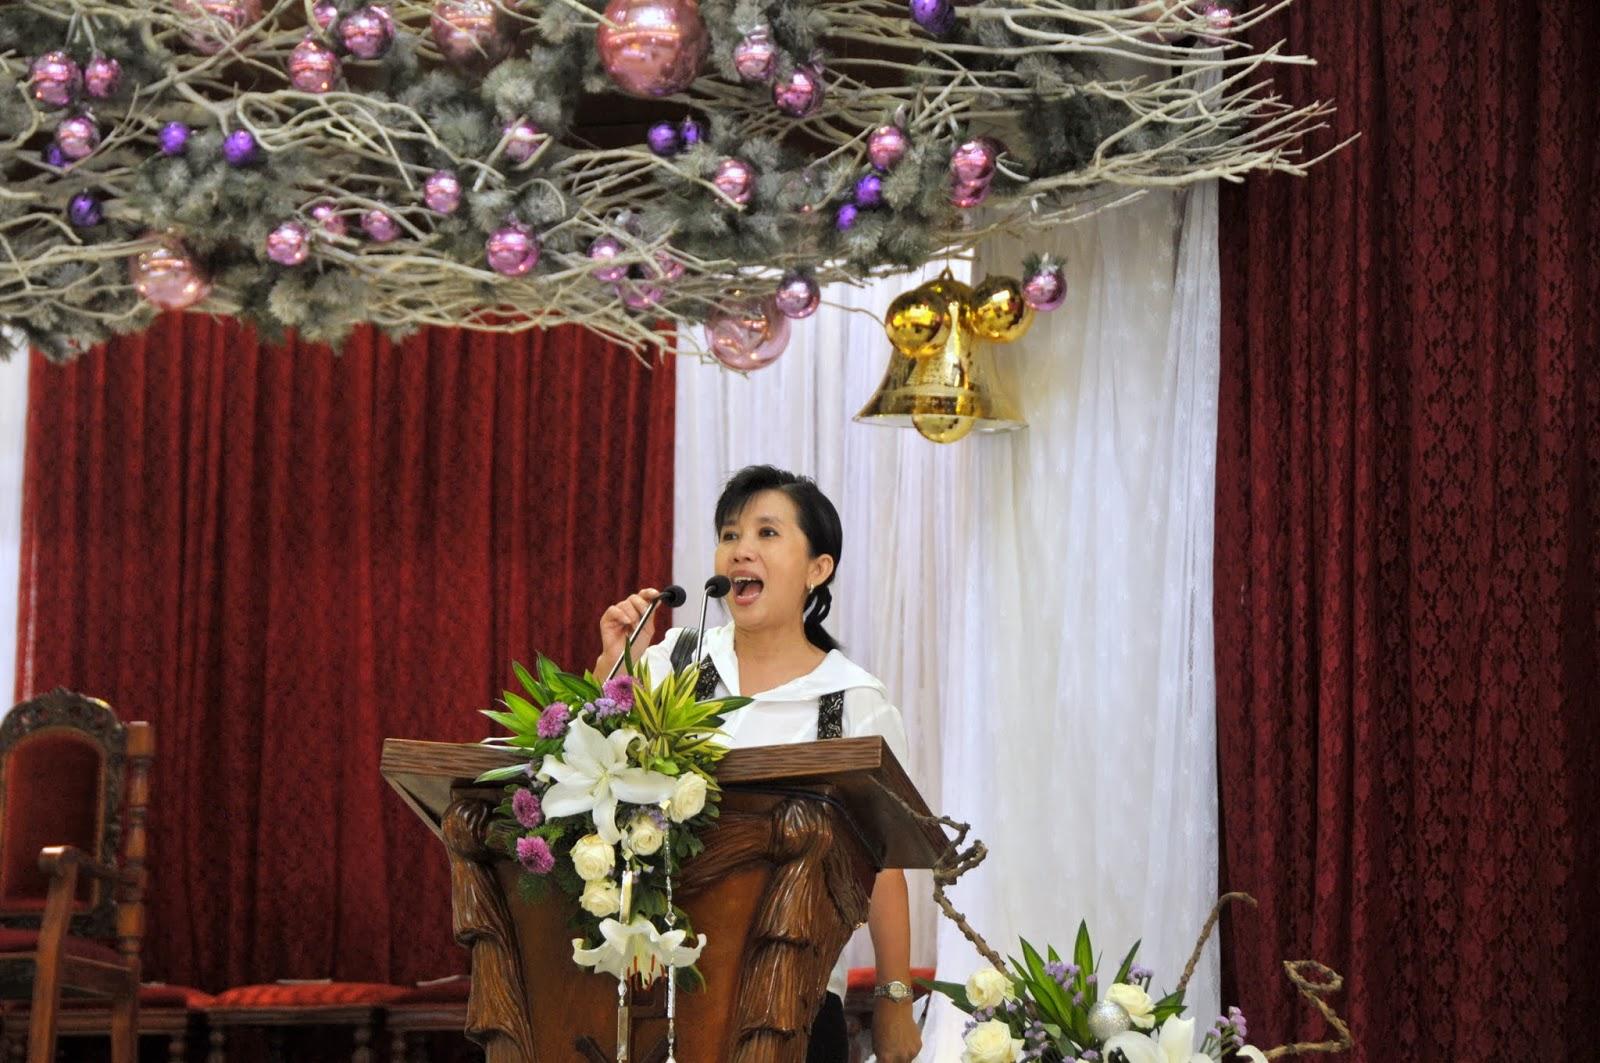 Perayaan Natal MKK - 25 Desember 2013 - Panggung Boneka